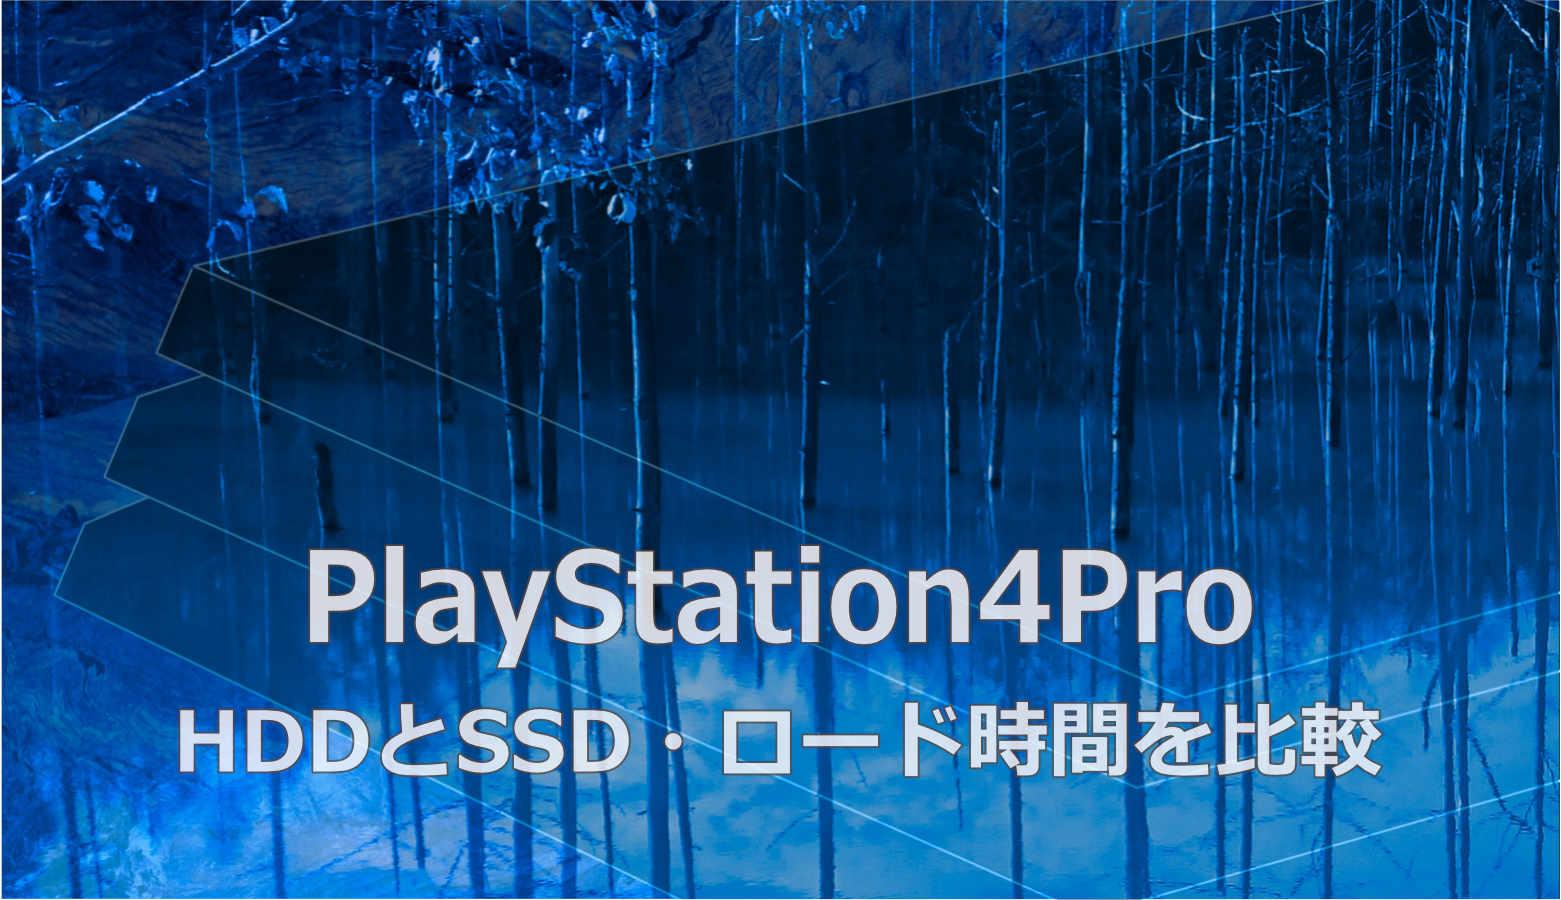 PlayStation4Pro:HDD vs SSD!内蔵ストレージのロード時間を比較